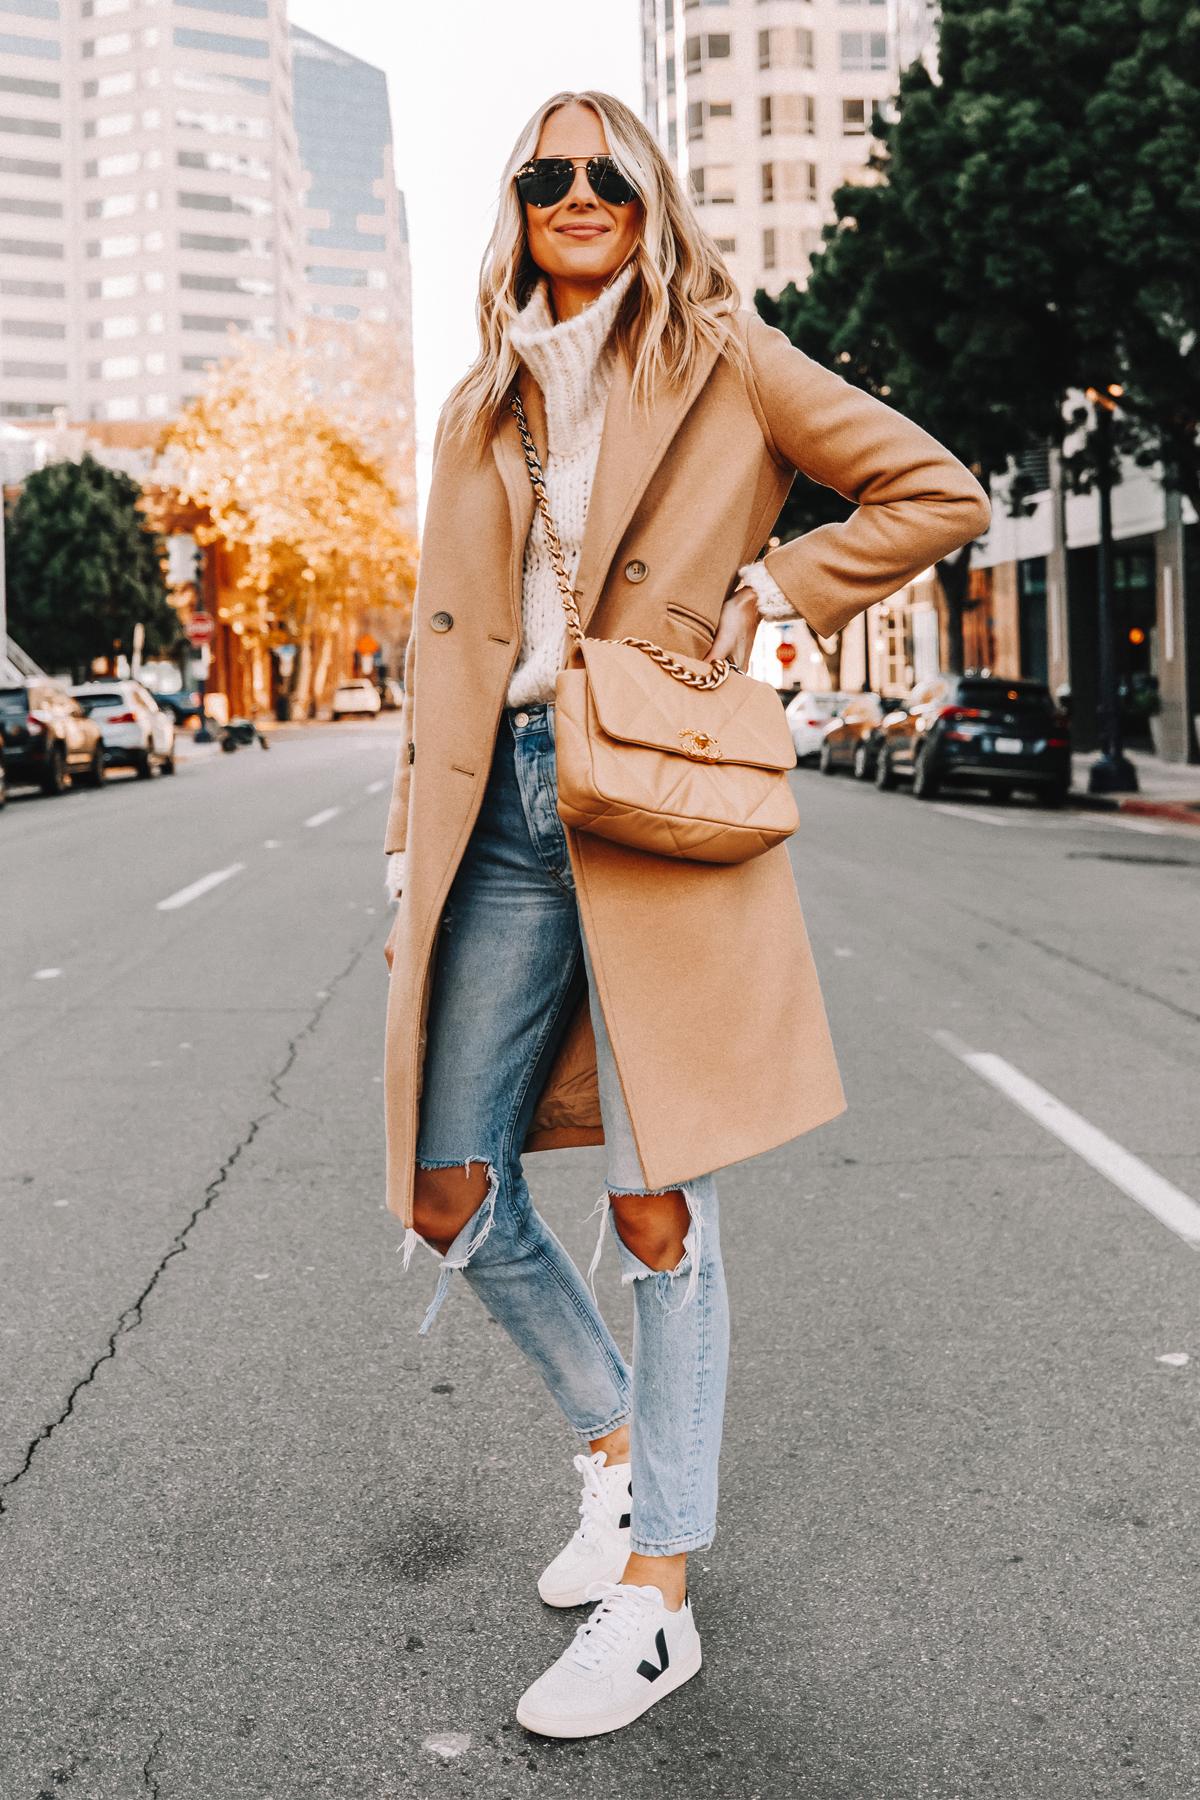 Fashion Jackson Wearing Everlane Camel Coat White Chunky Turtleneck Sweater Ripped Jeans Veja V10 Sneakers Chanel 19 Beige Handbag